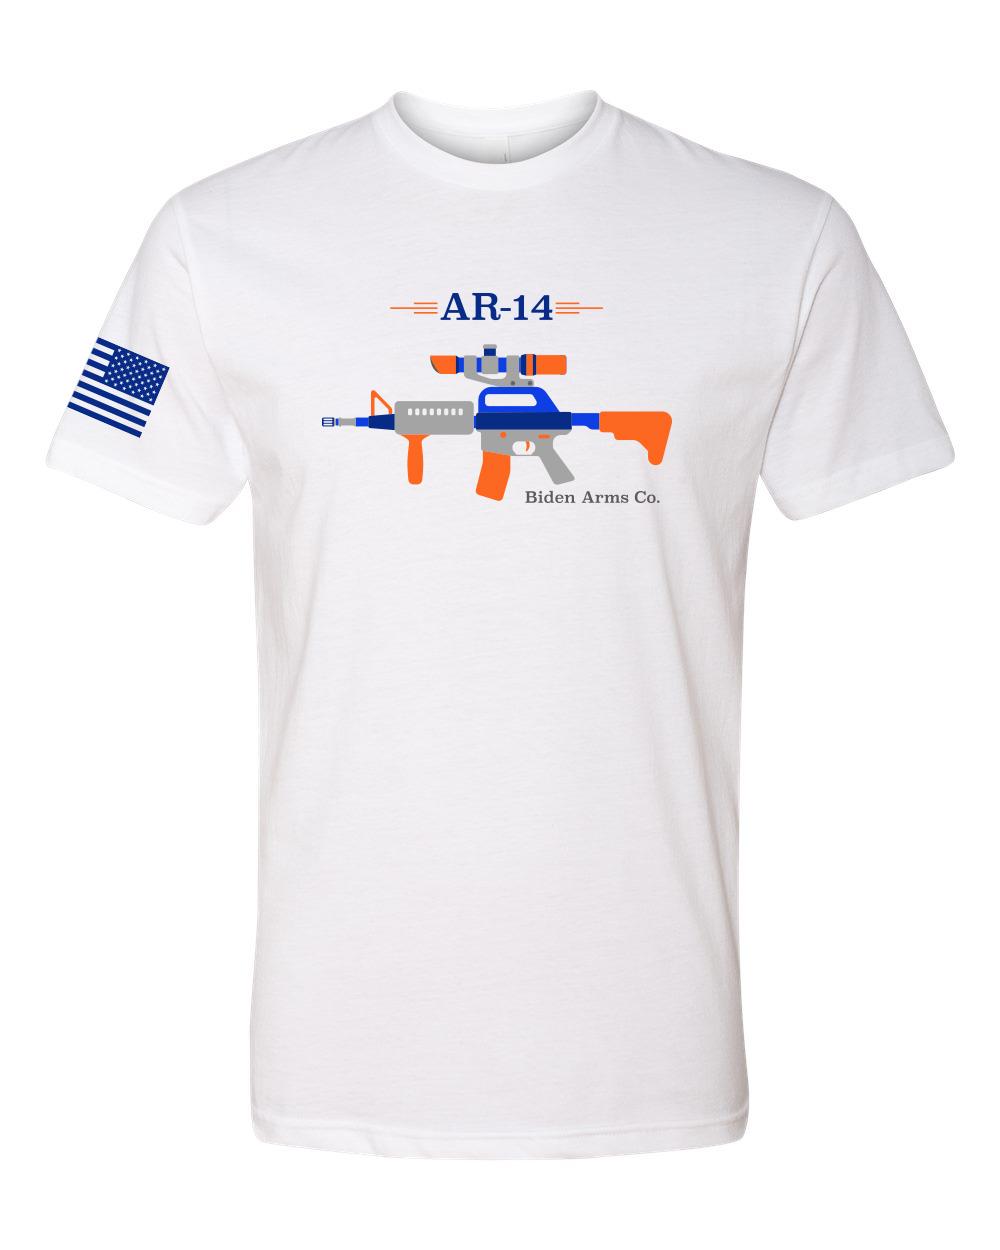 AR-14 - Biden Arms Co - Don't be a horses ass - Adult Mens ...